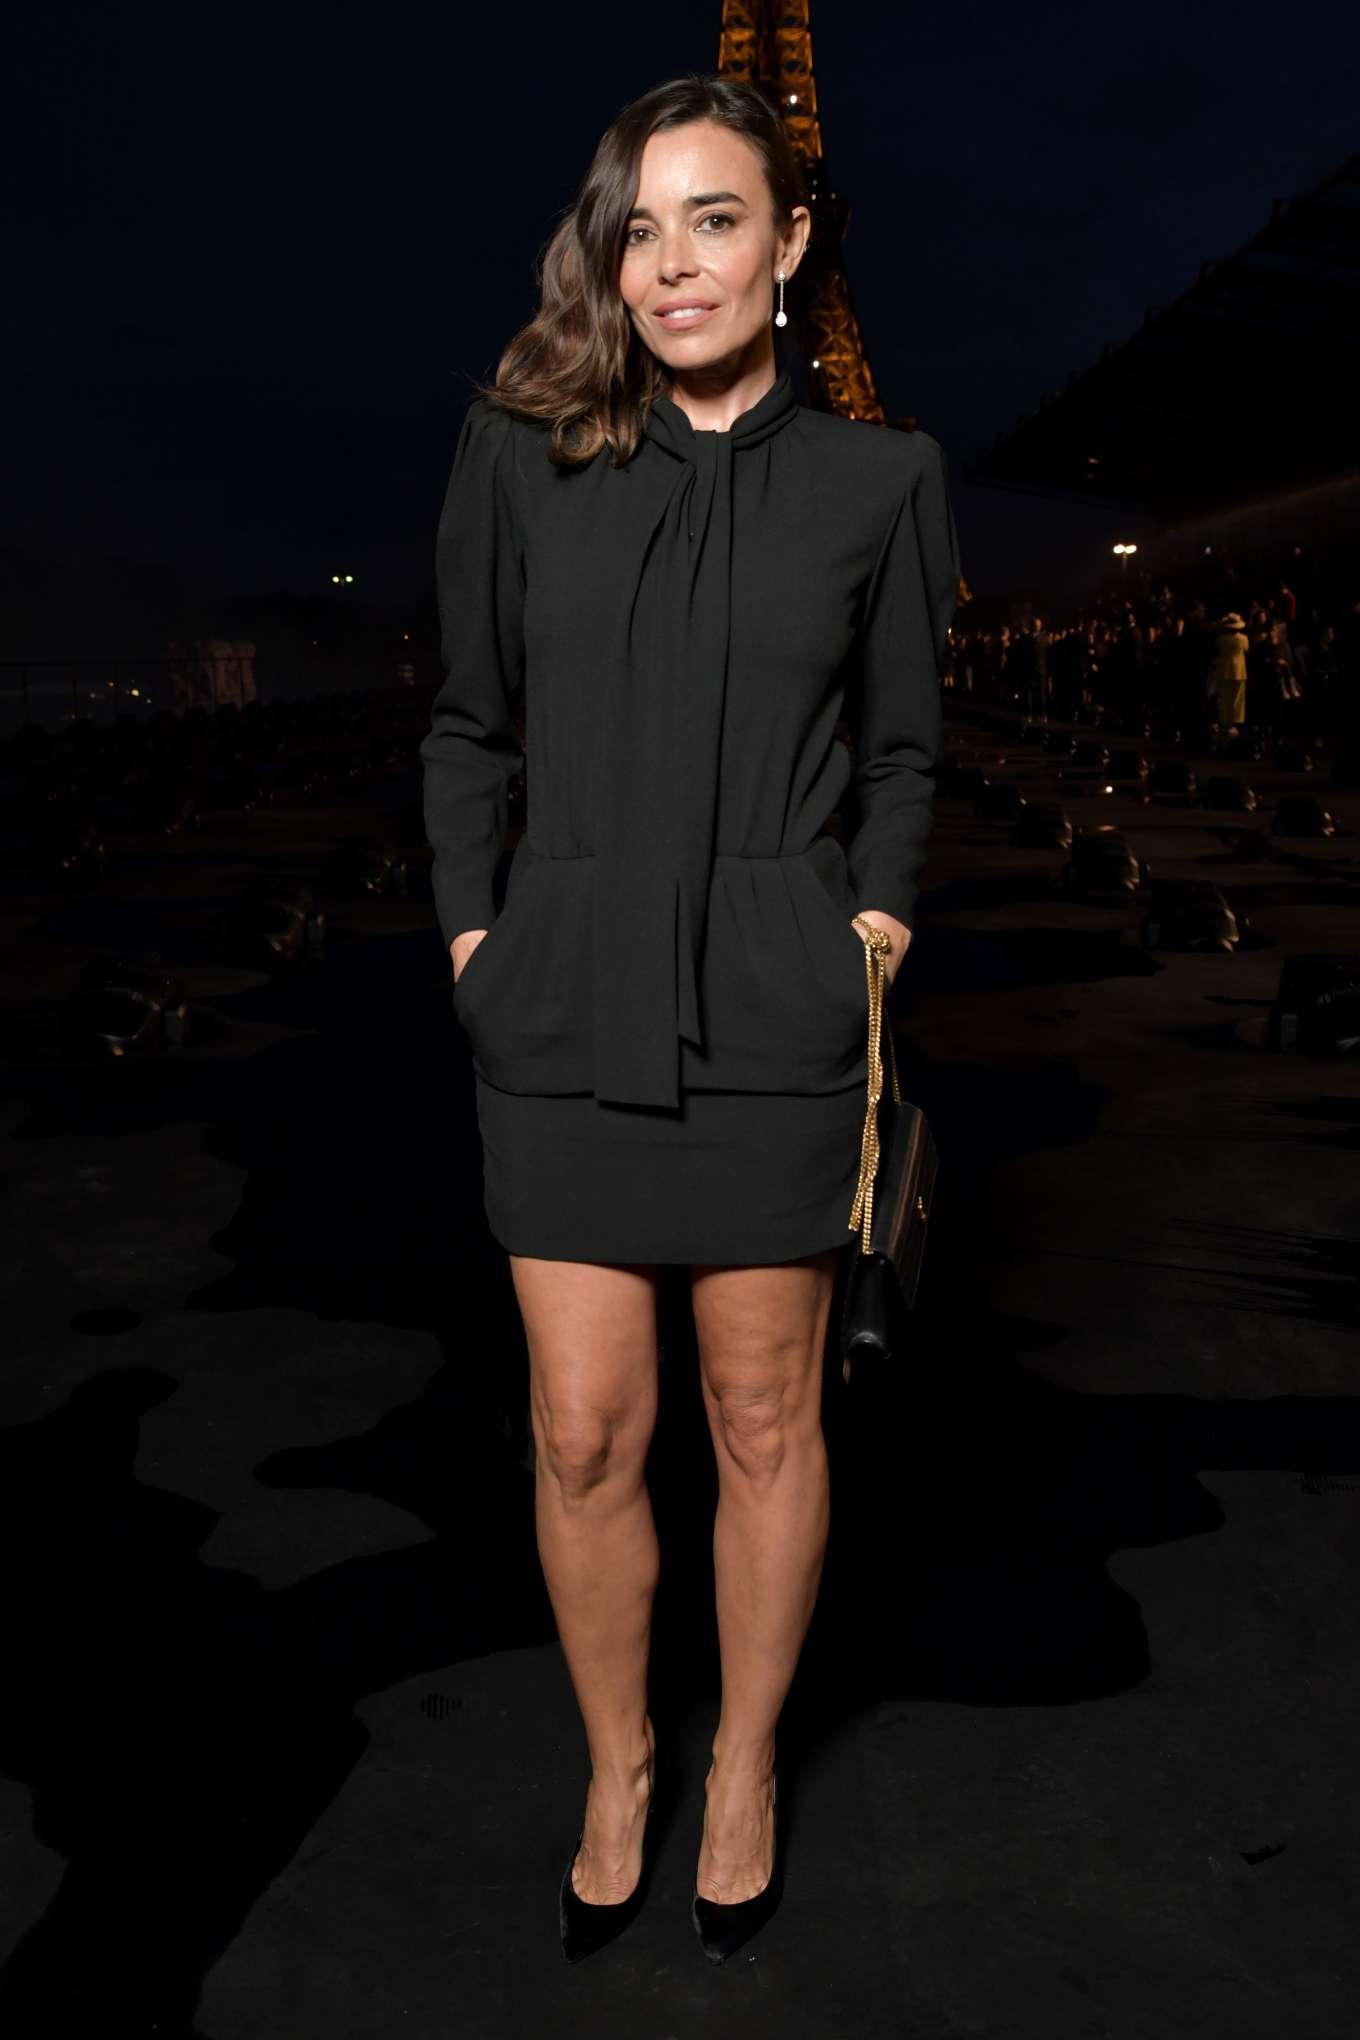 Elodie Bouchez 2019 : Elodie Bouchez – Saint Laurent Womenswear SS 2020 Show at Paris Fashion Week-12